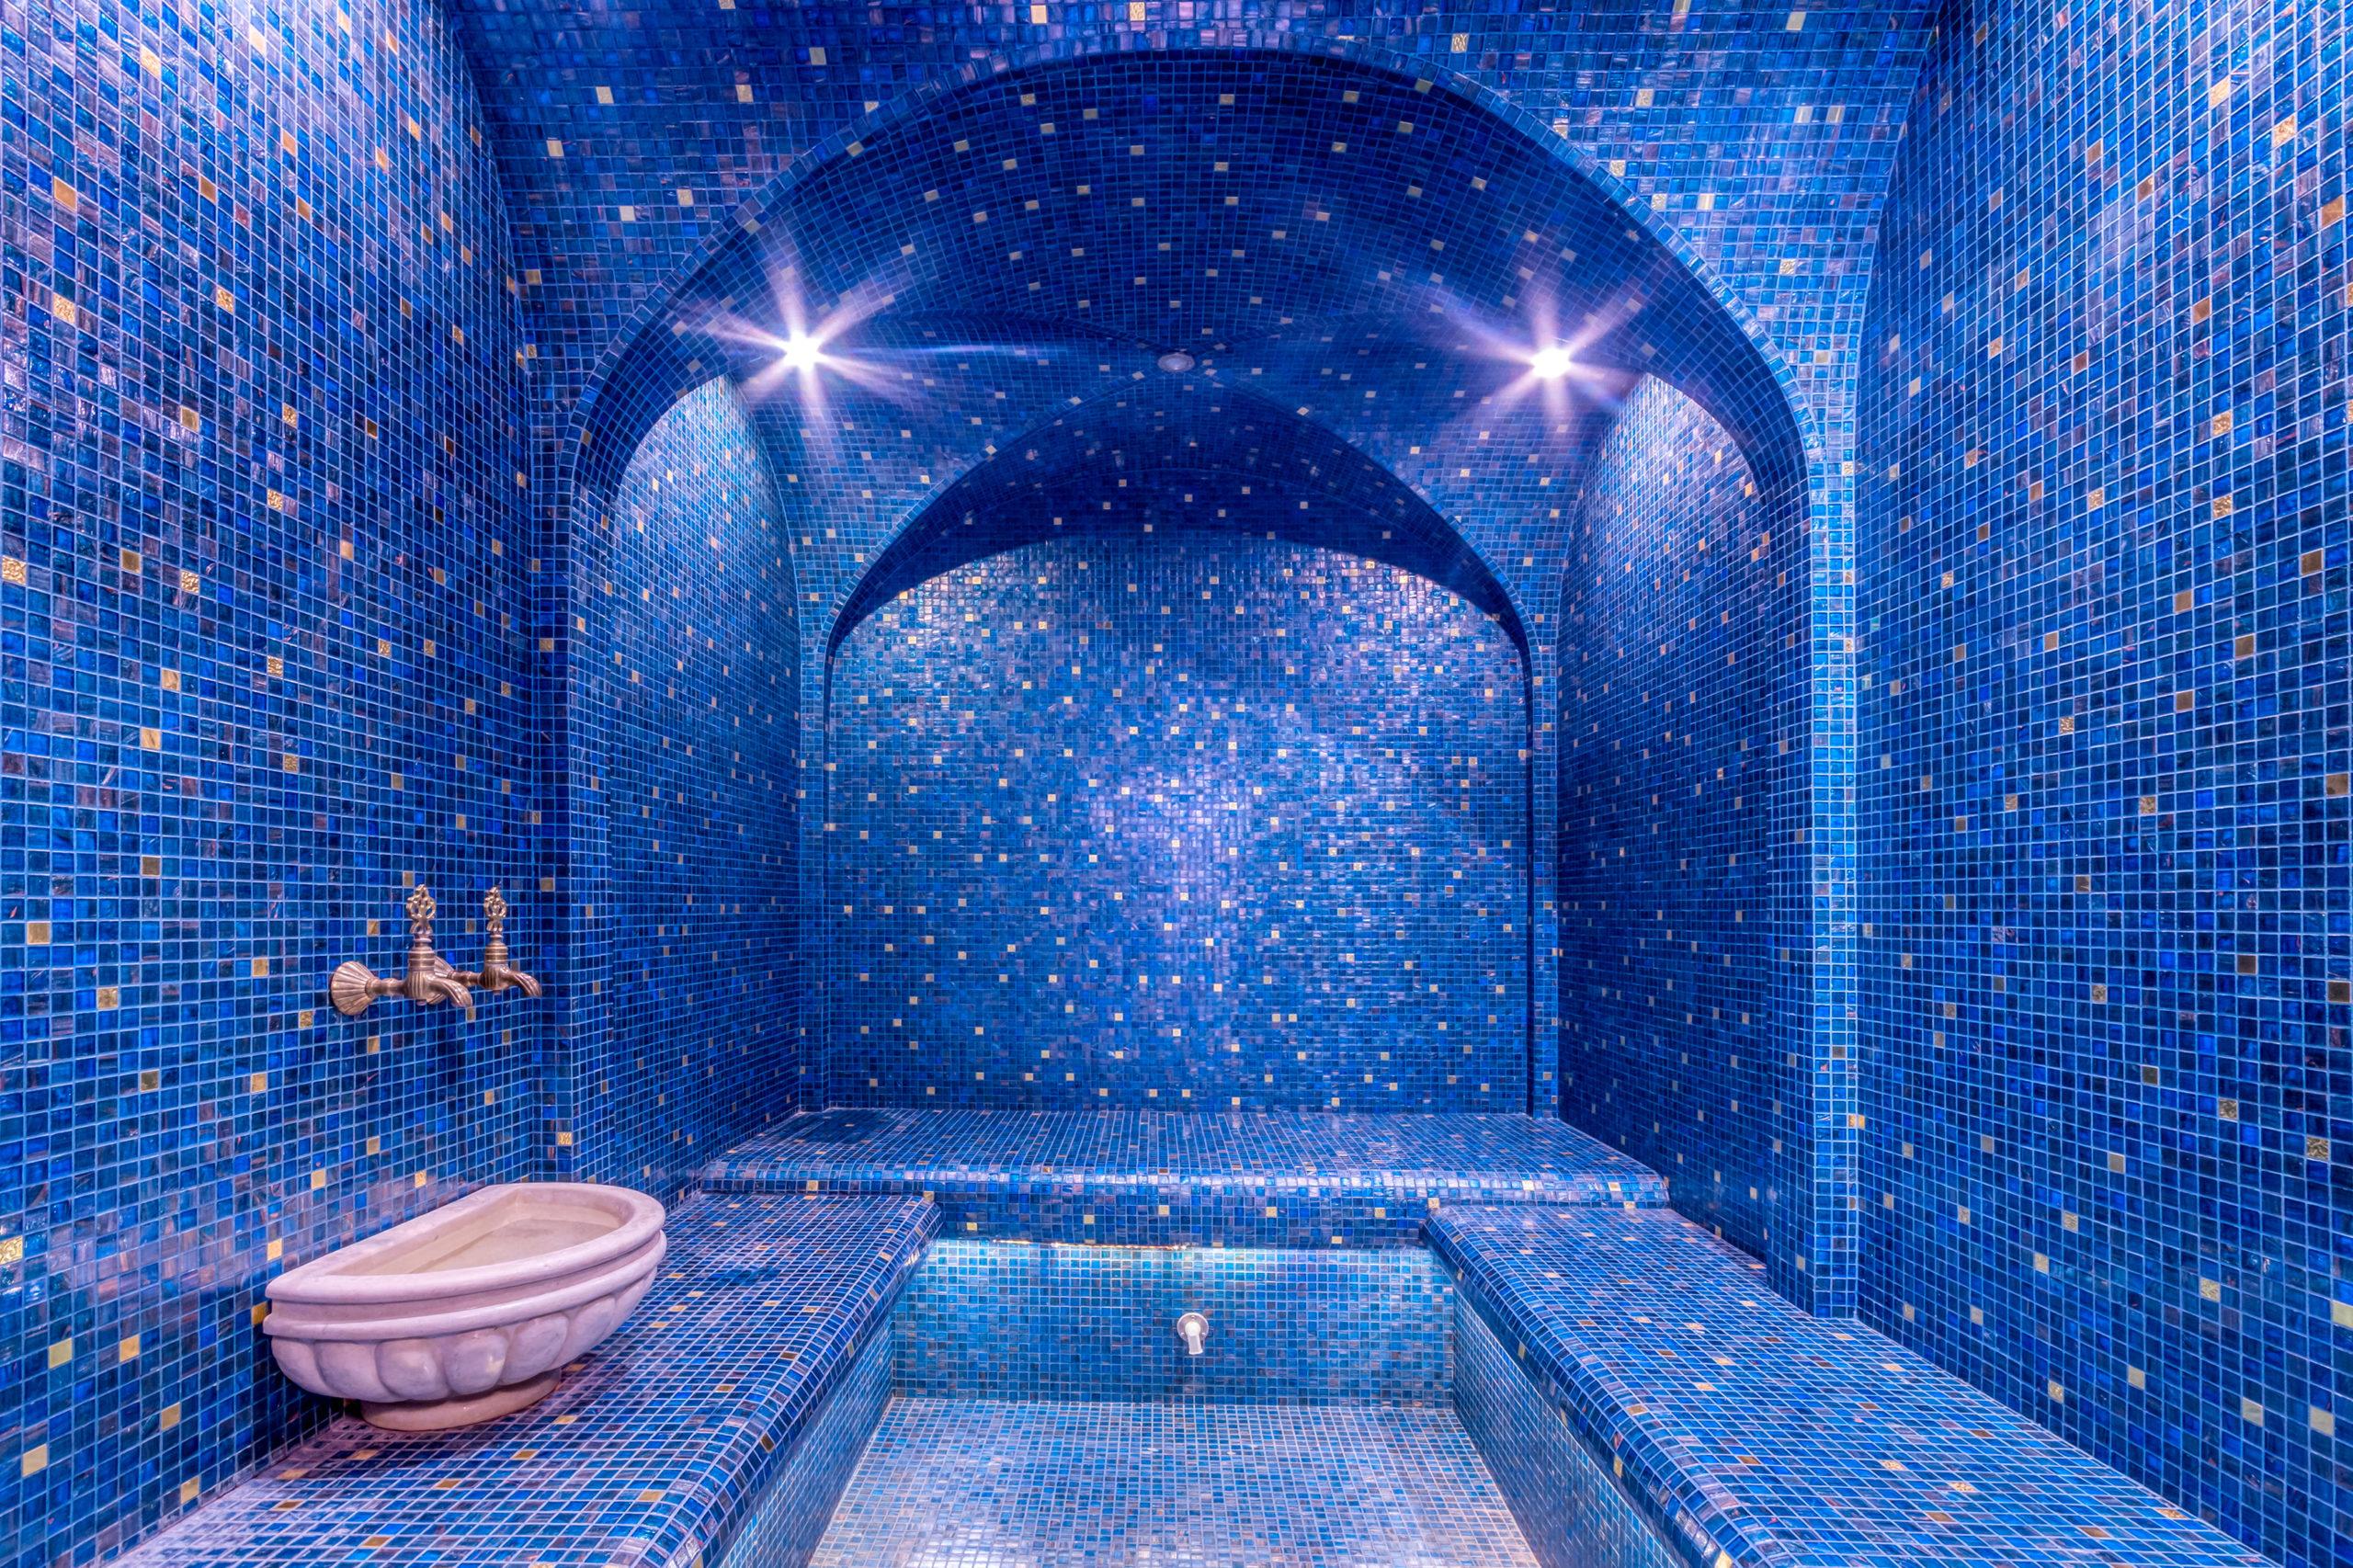 hammam orientale avec mosaique bleu